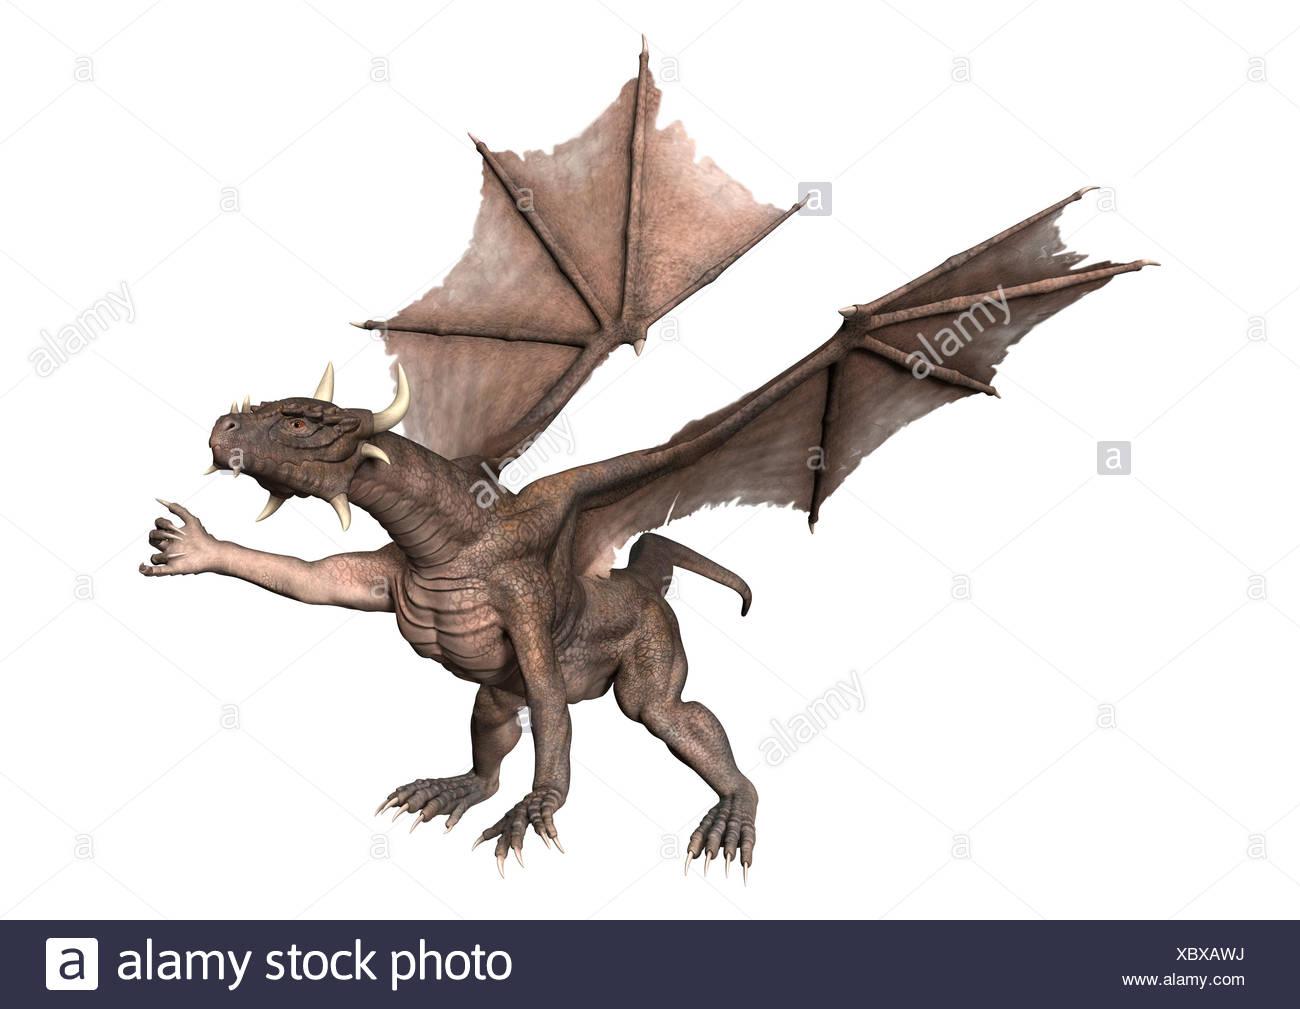 3D Rendering Fantasy Dragon on White - Stock Image